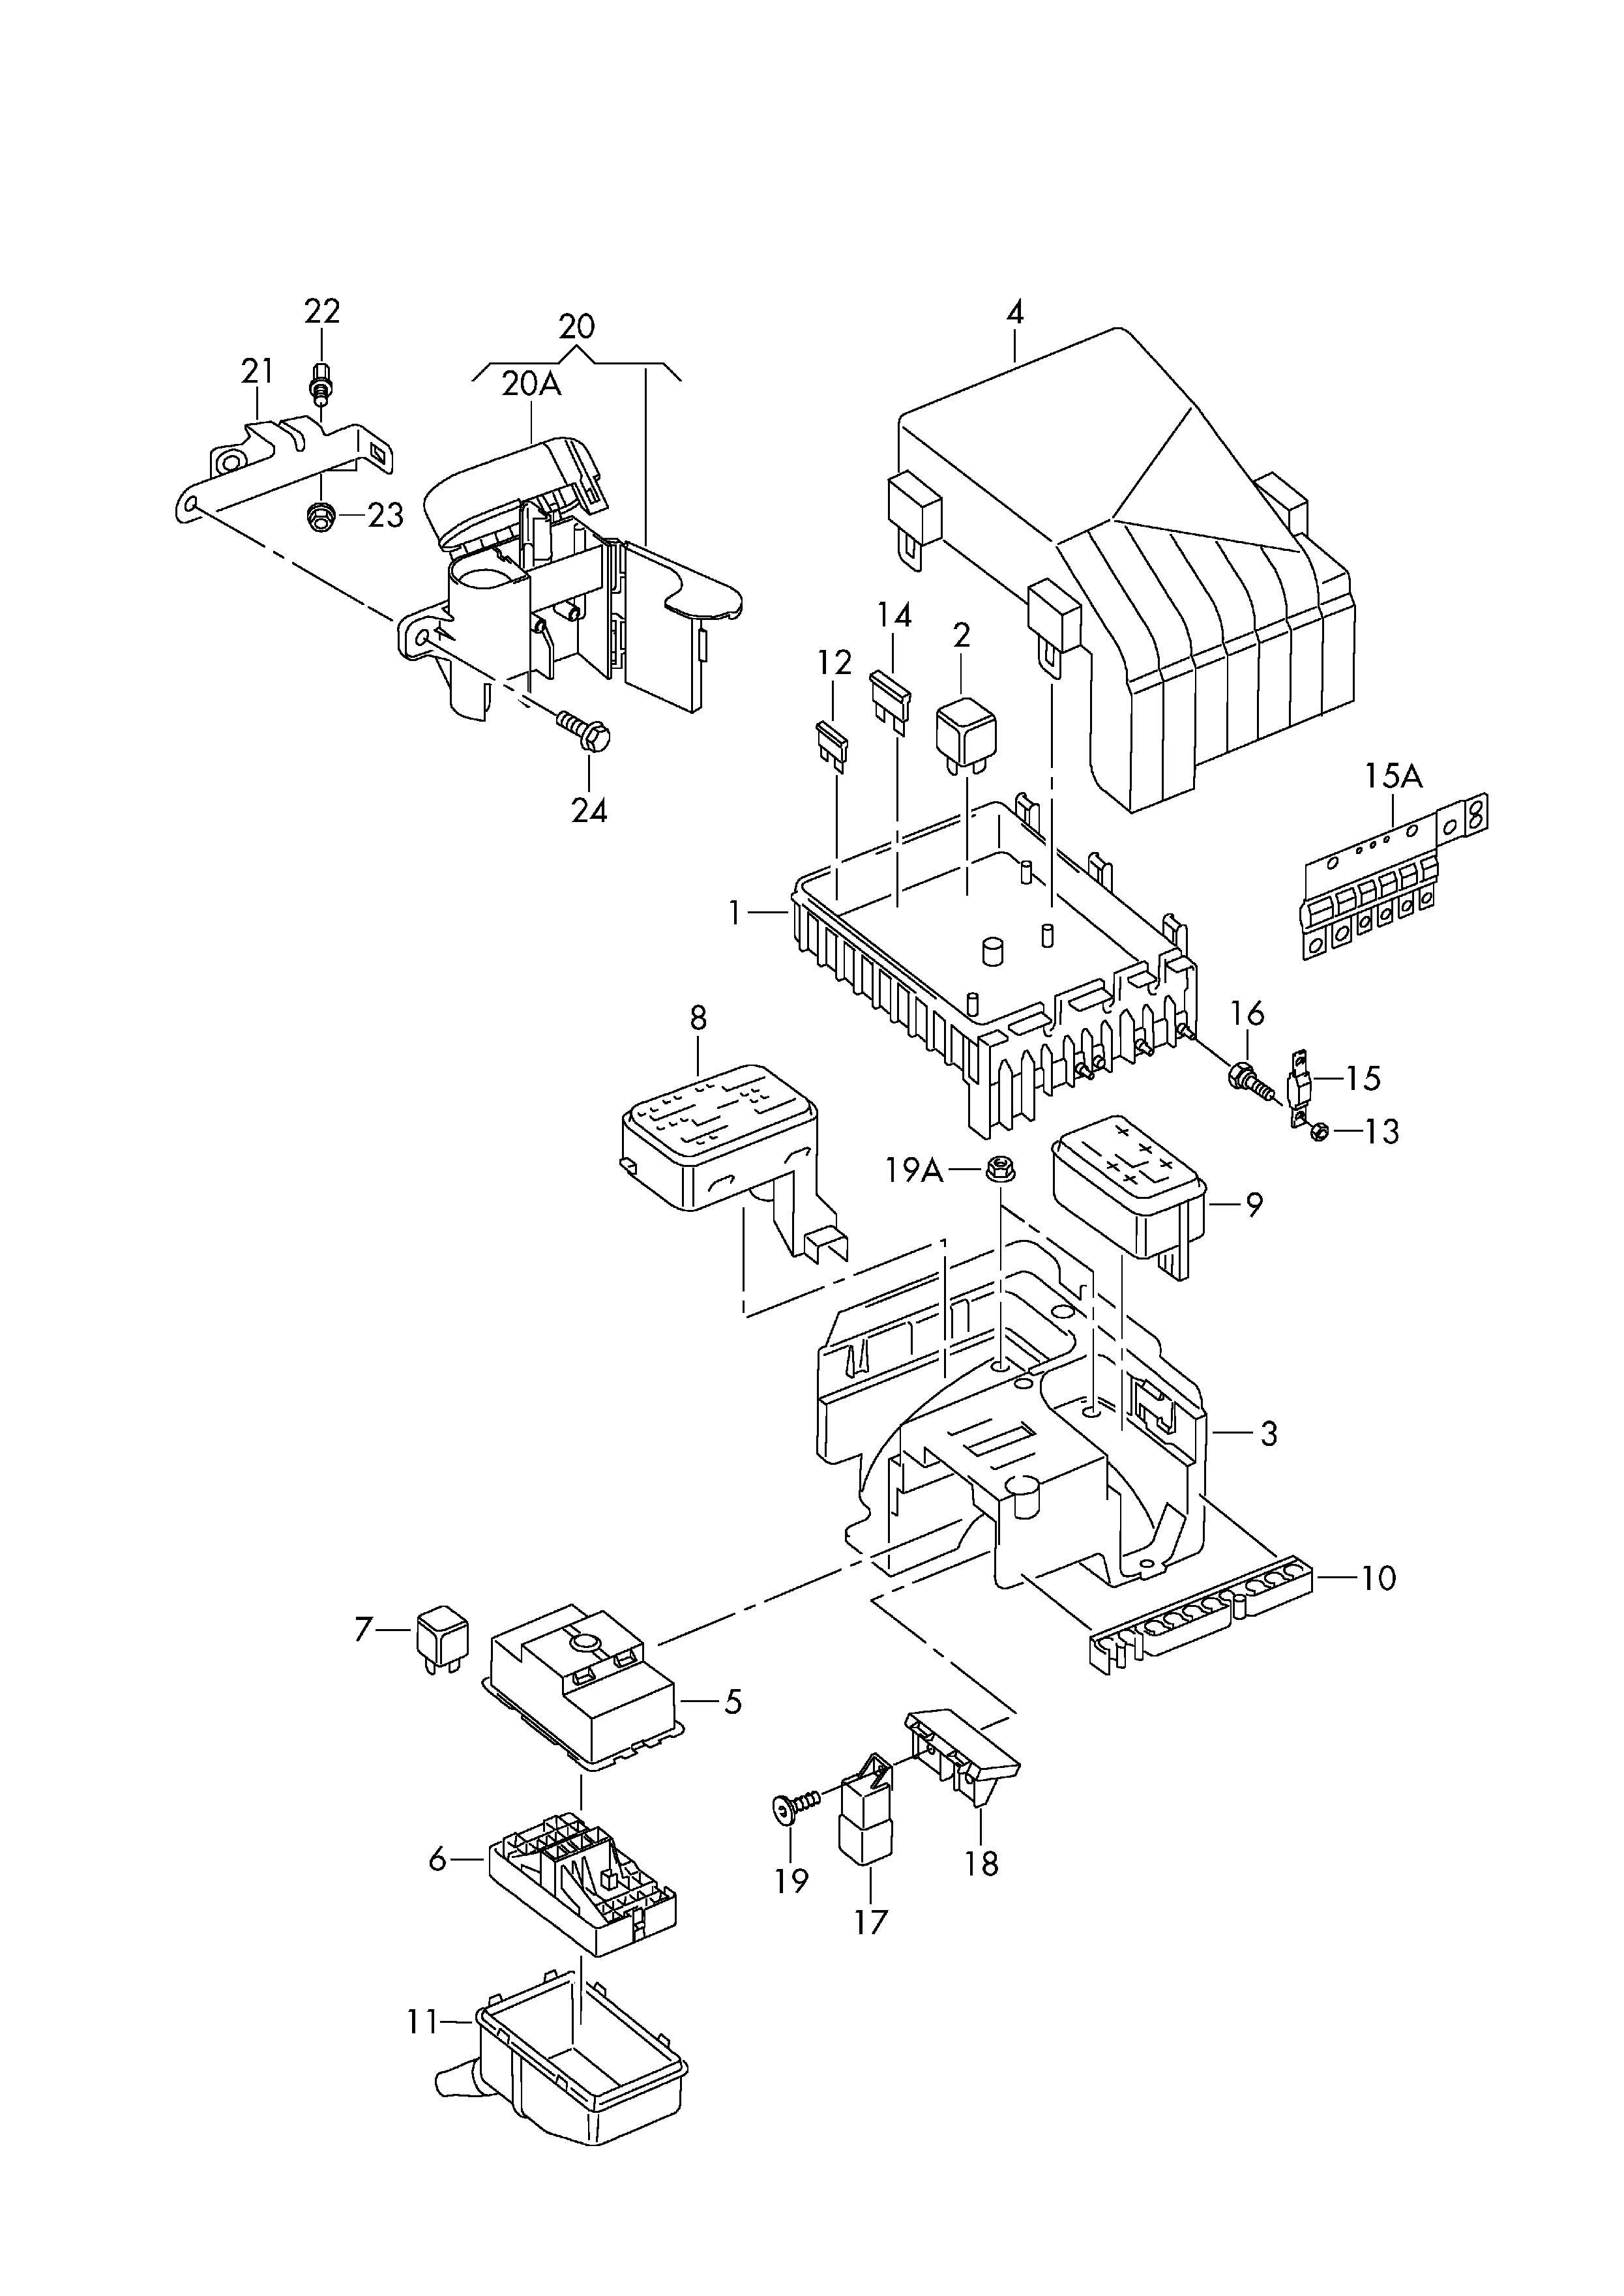 Fuse Box Volkswagen Touareg Diagram. Volkswagen. Auto